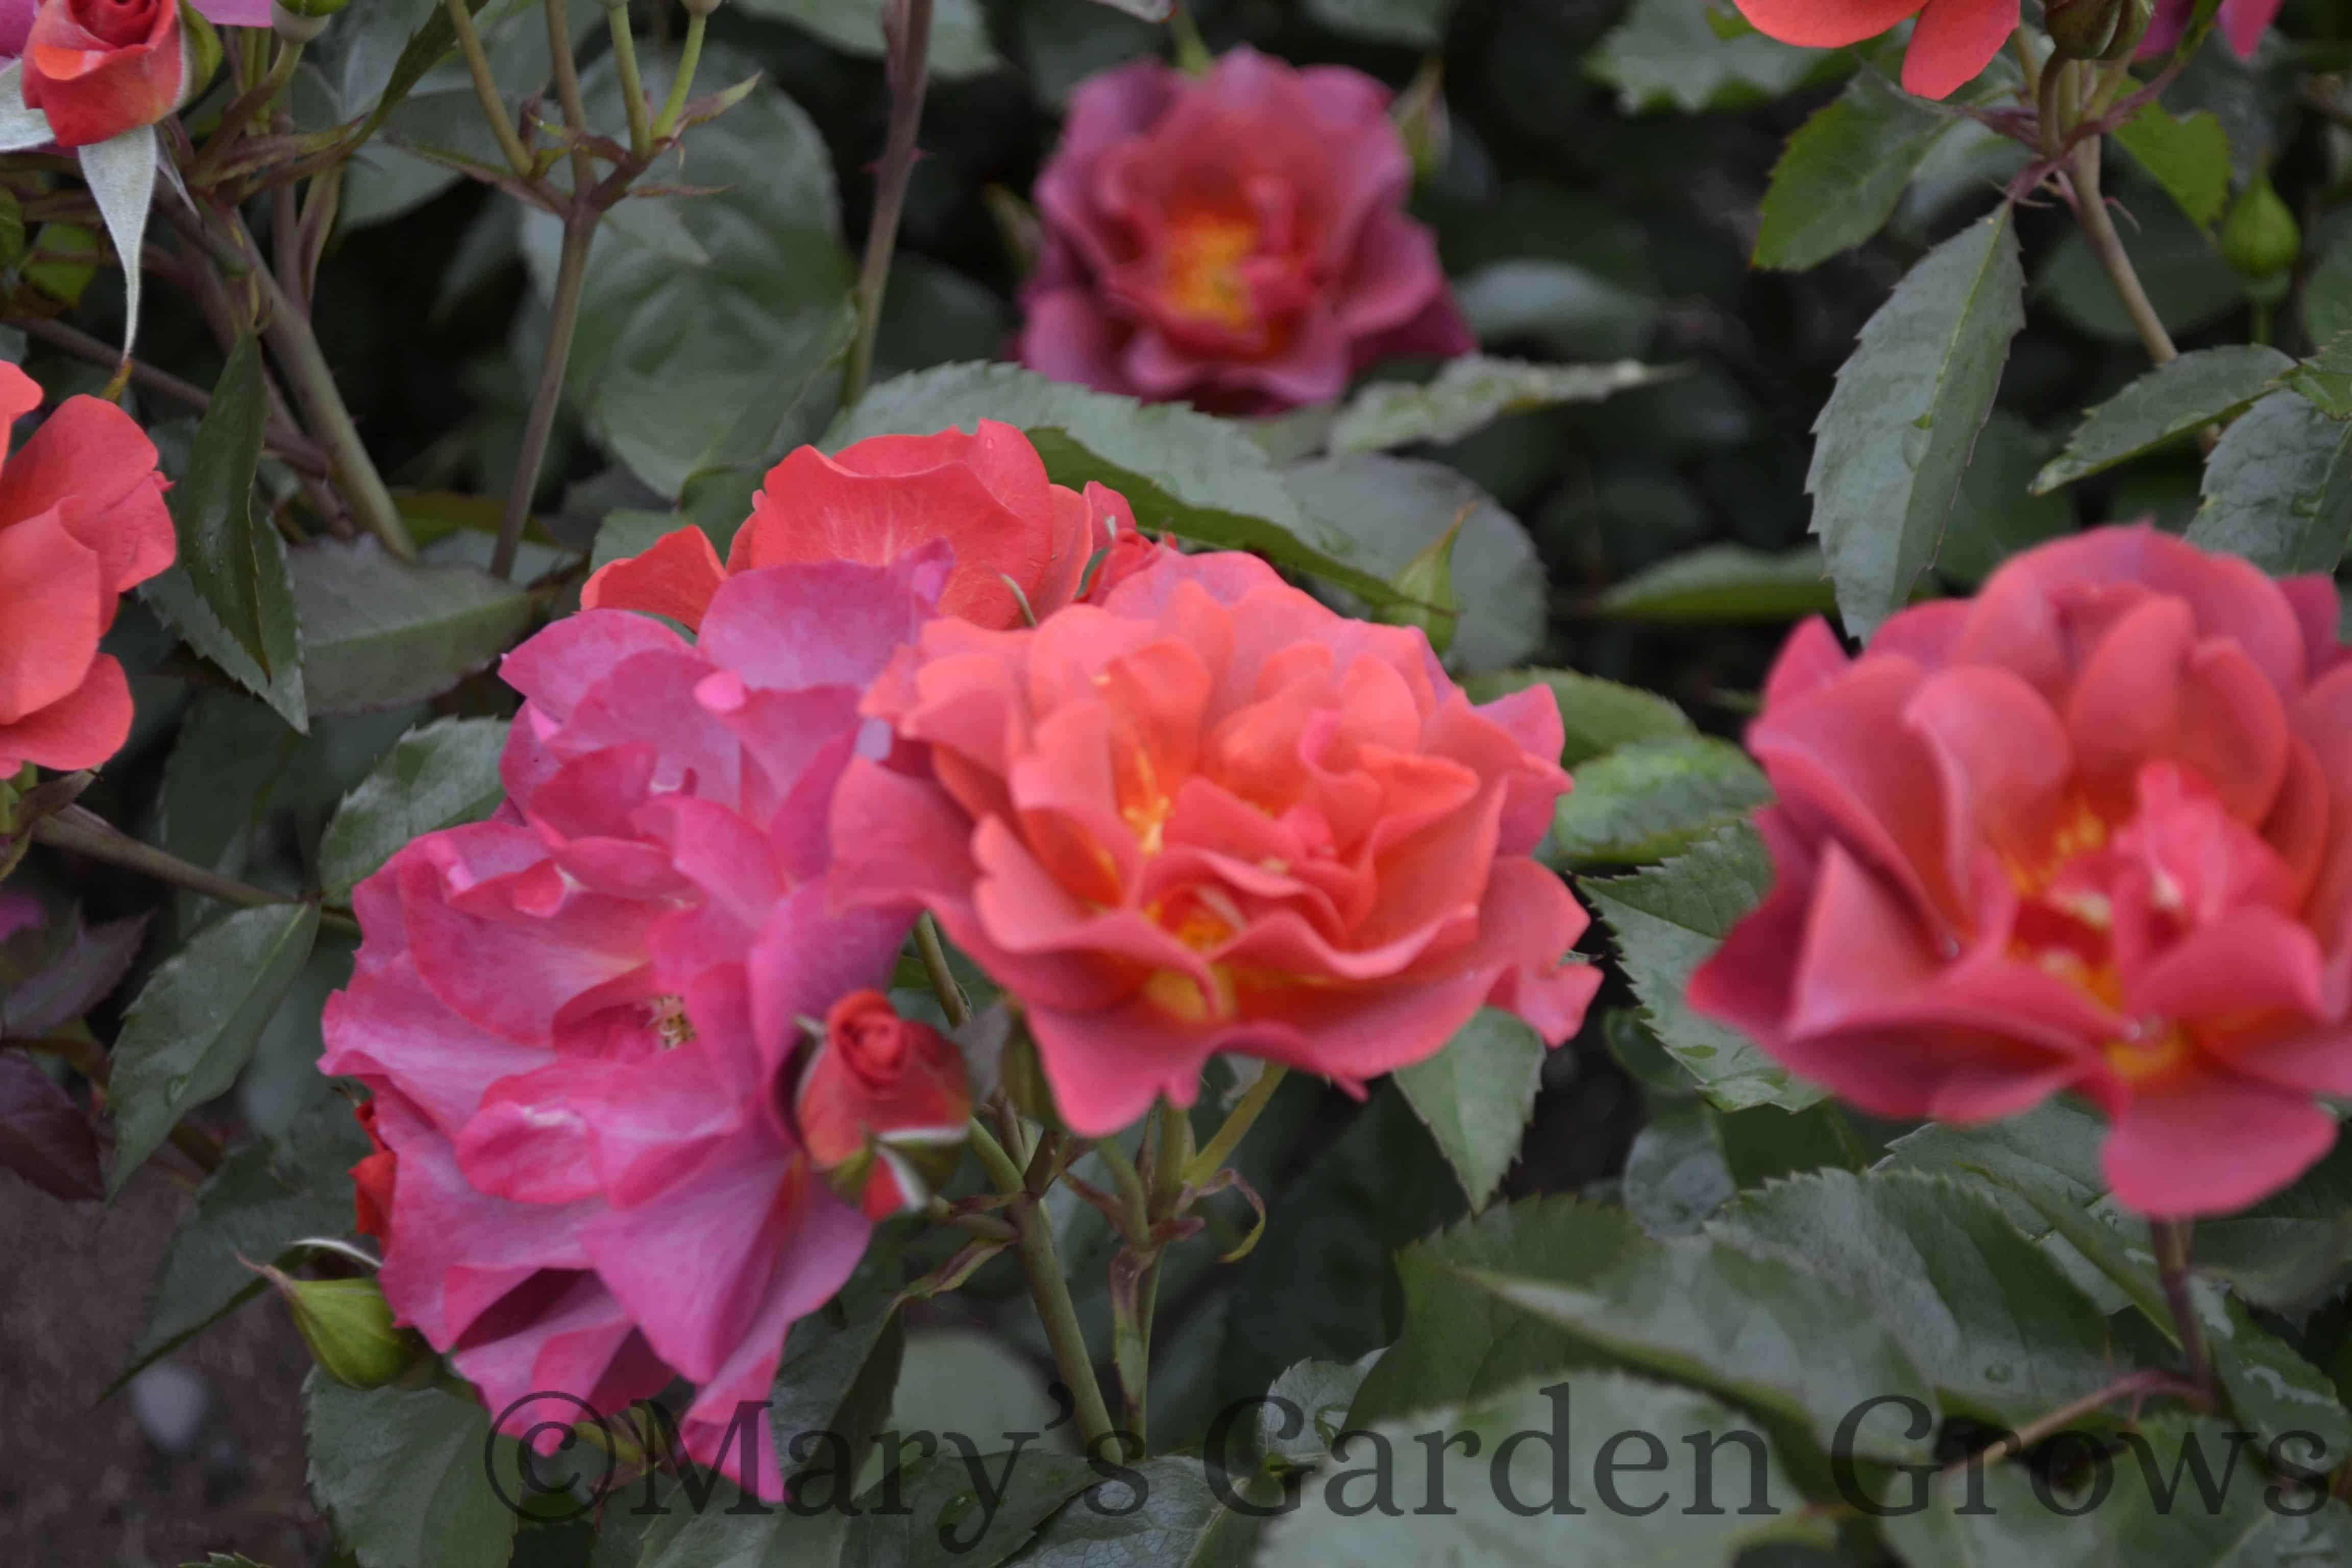 Duluth Rose Garden - Cinco De Mayo